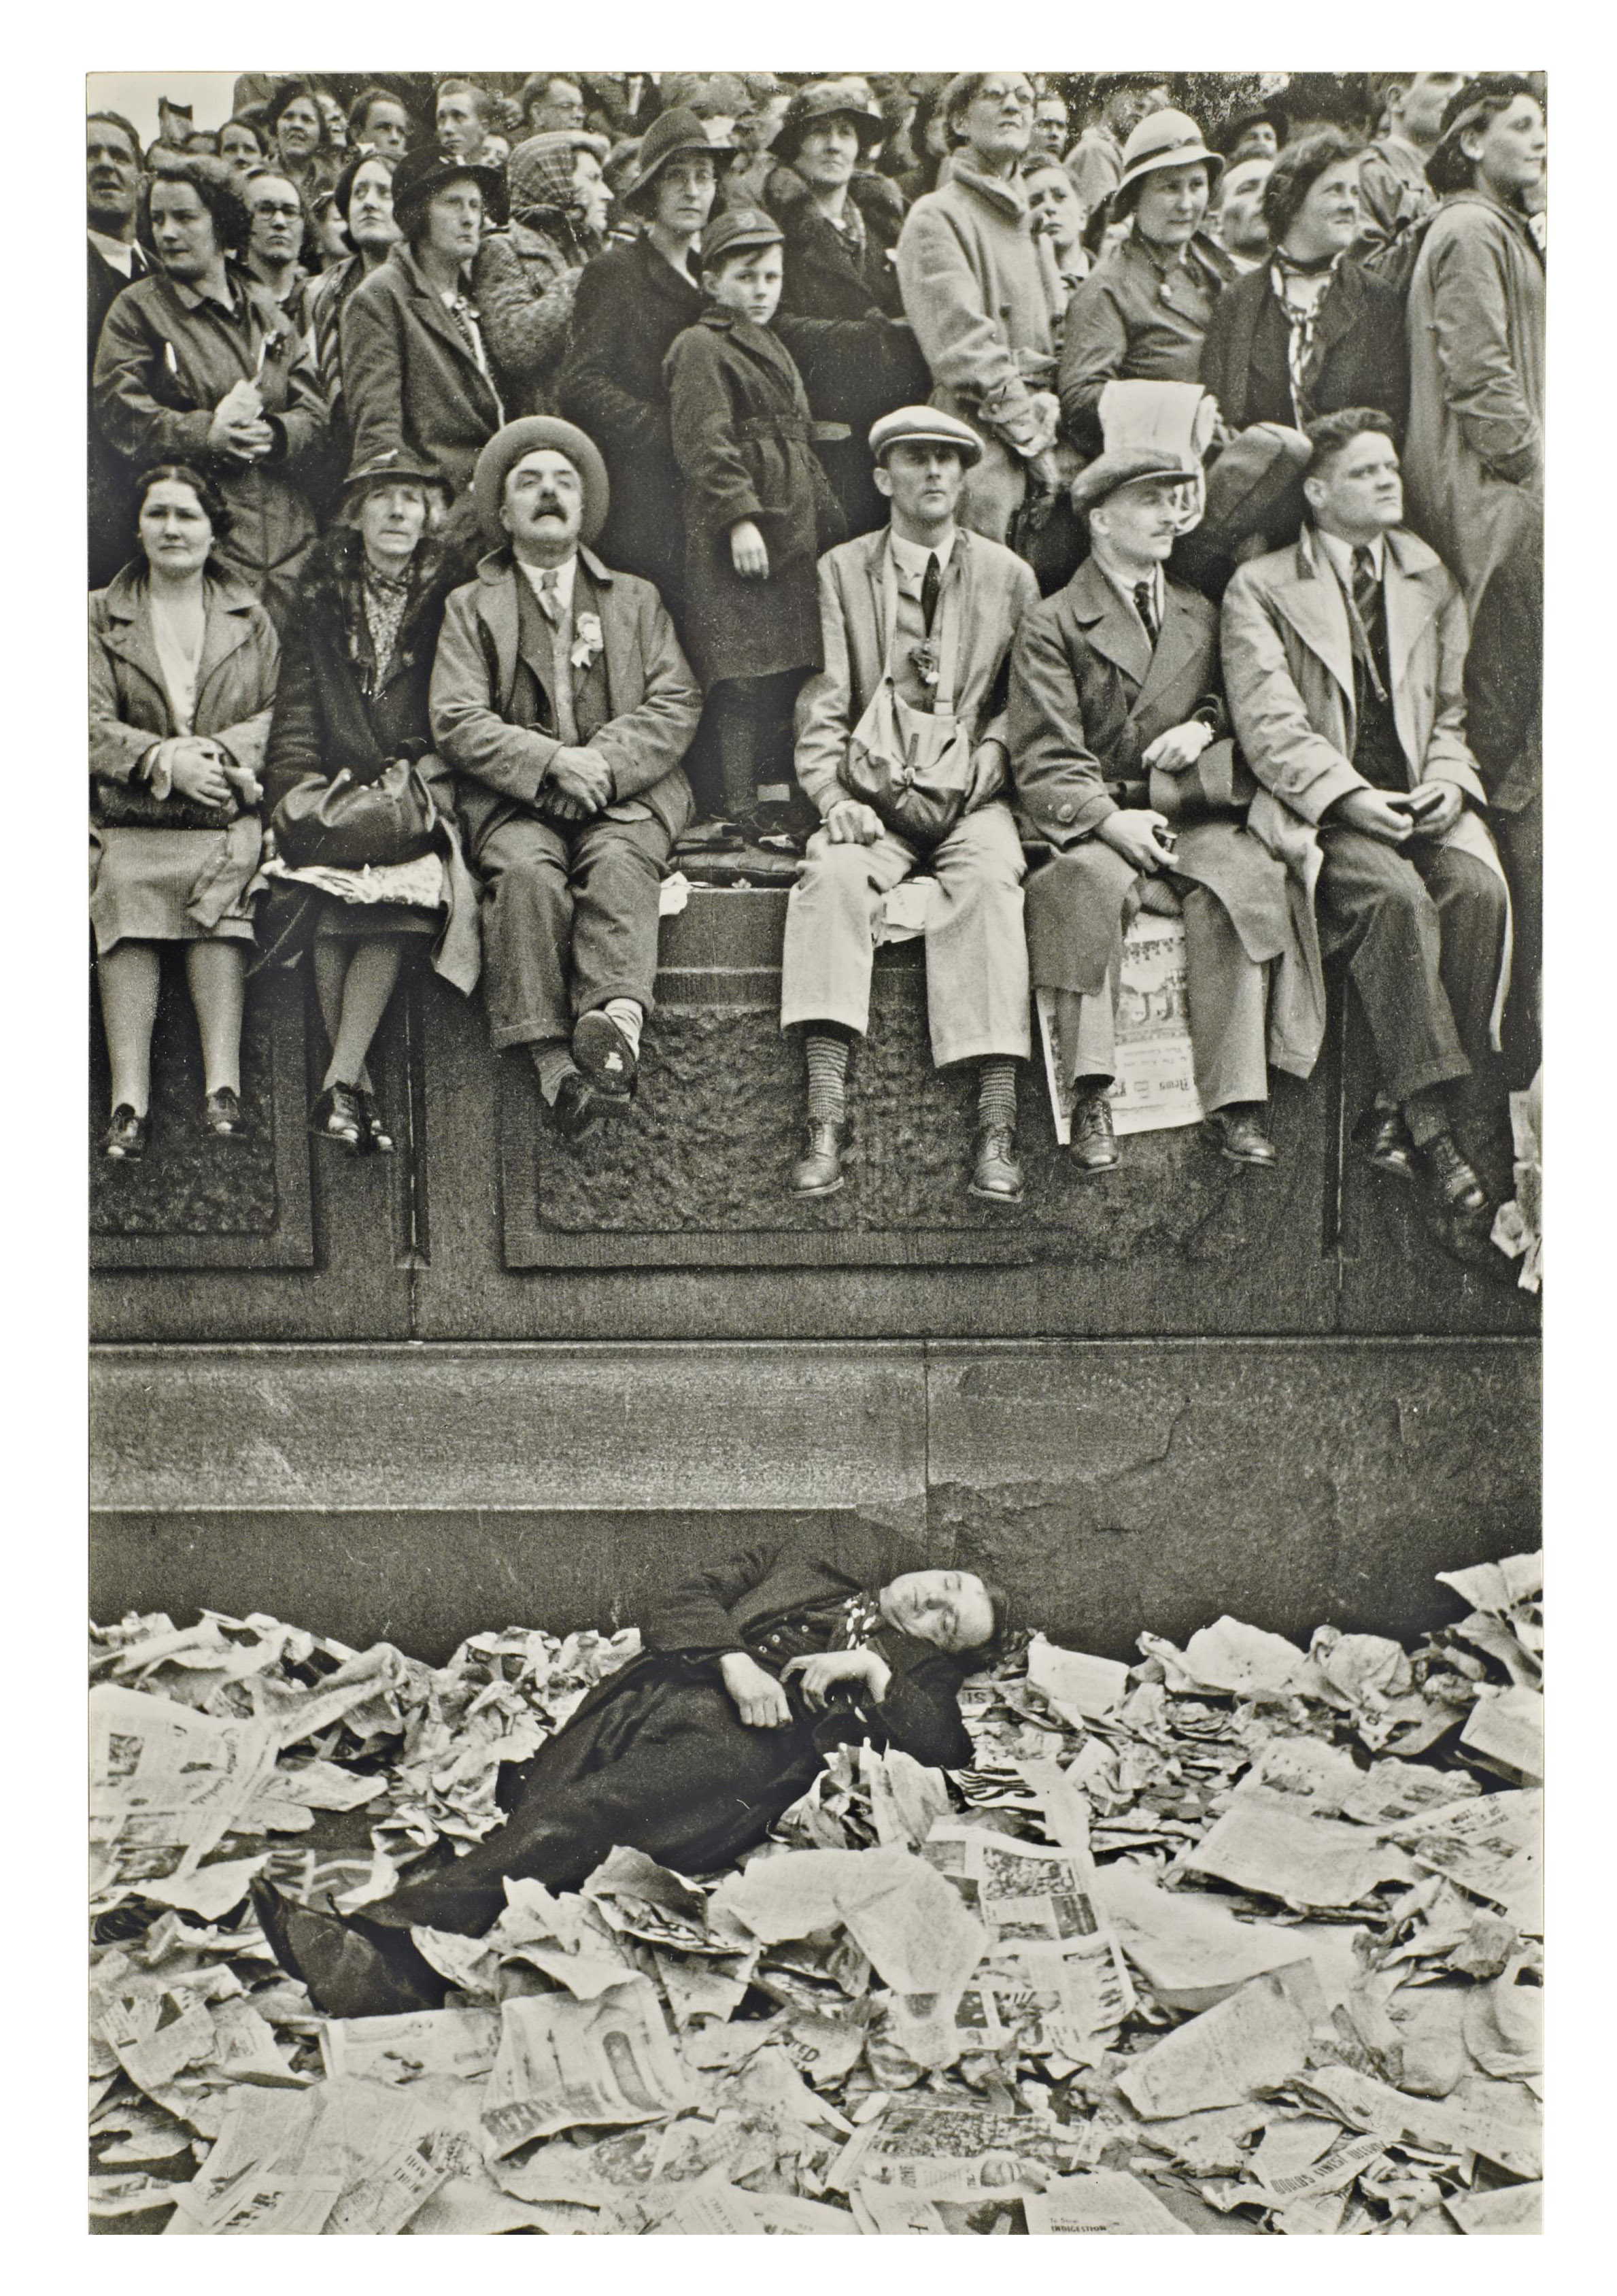 Couronnement du roi George VI, Trafalgar Square, Londres, 12 mai 1937